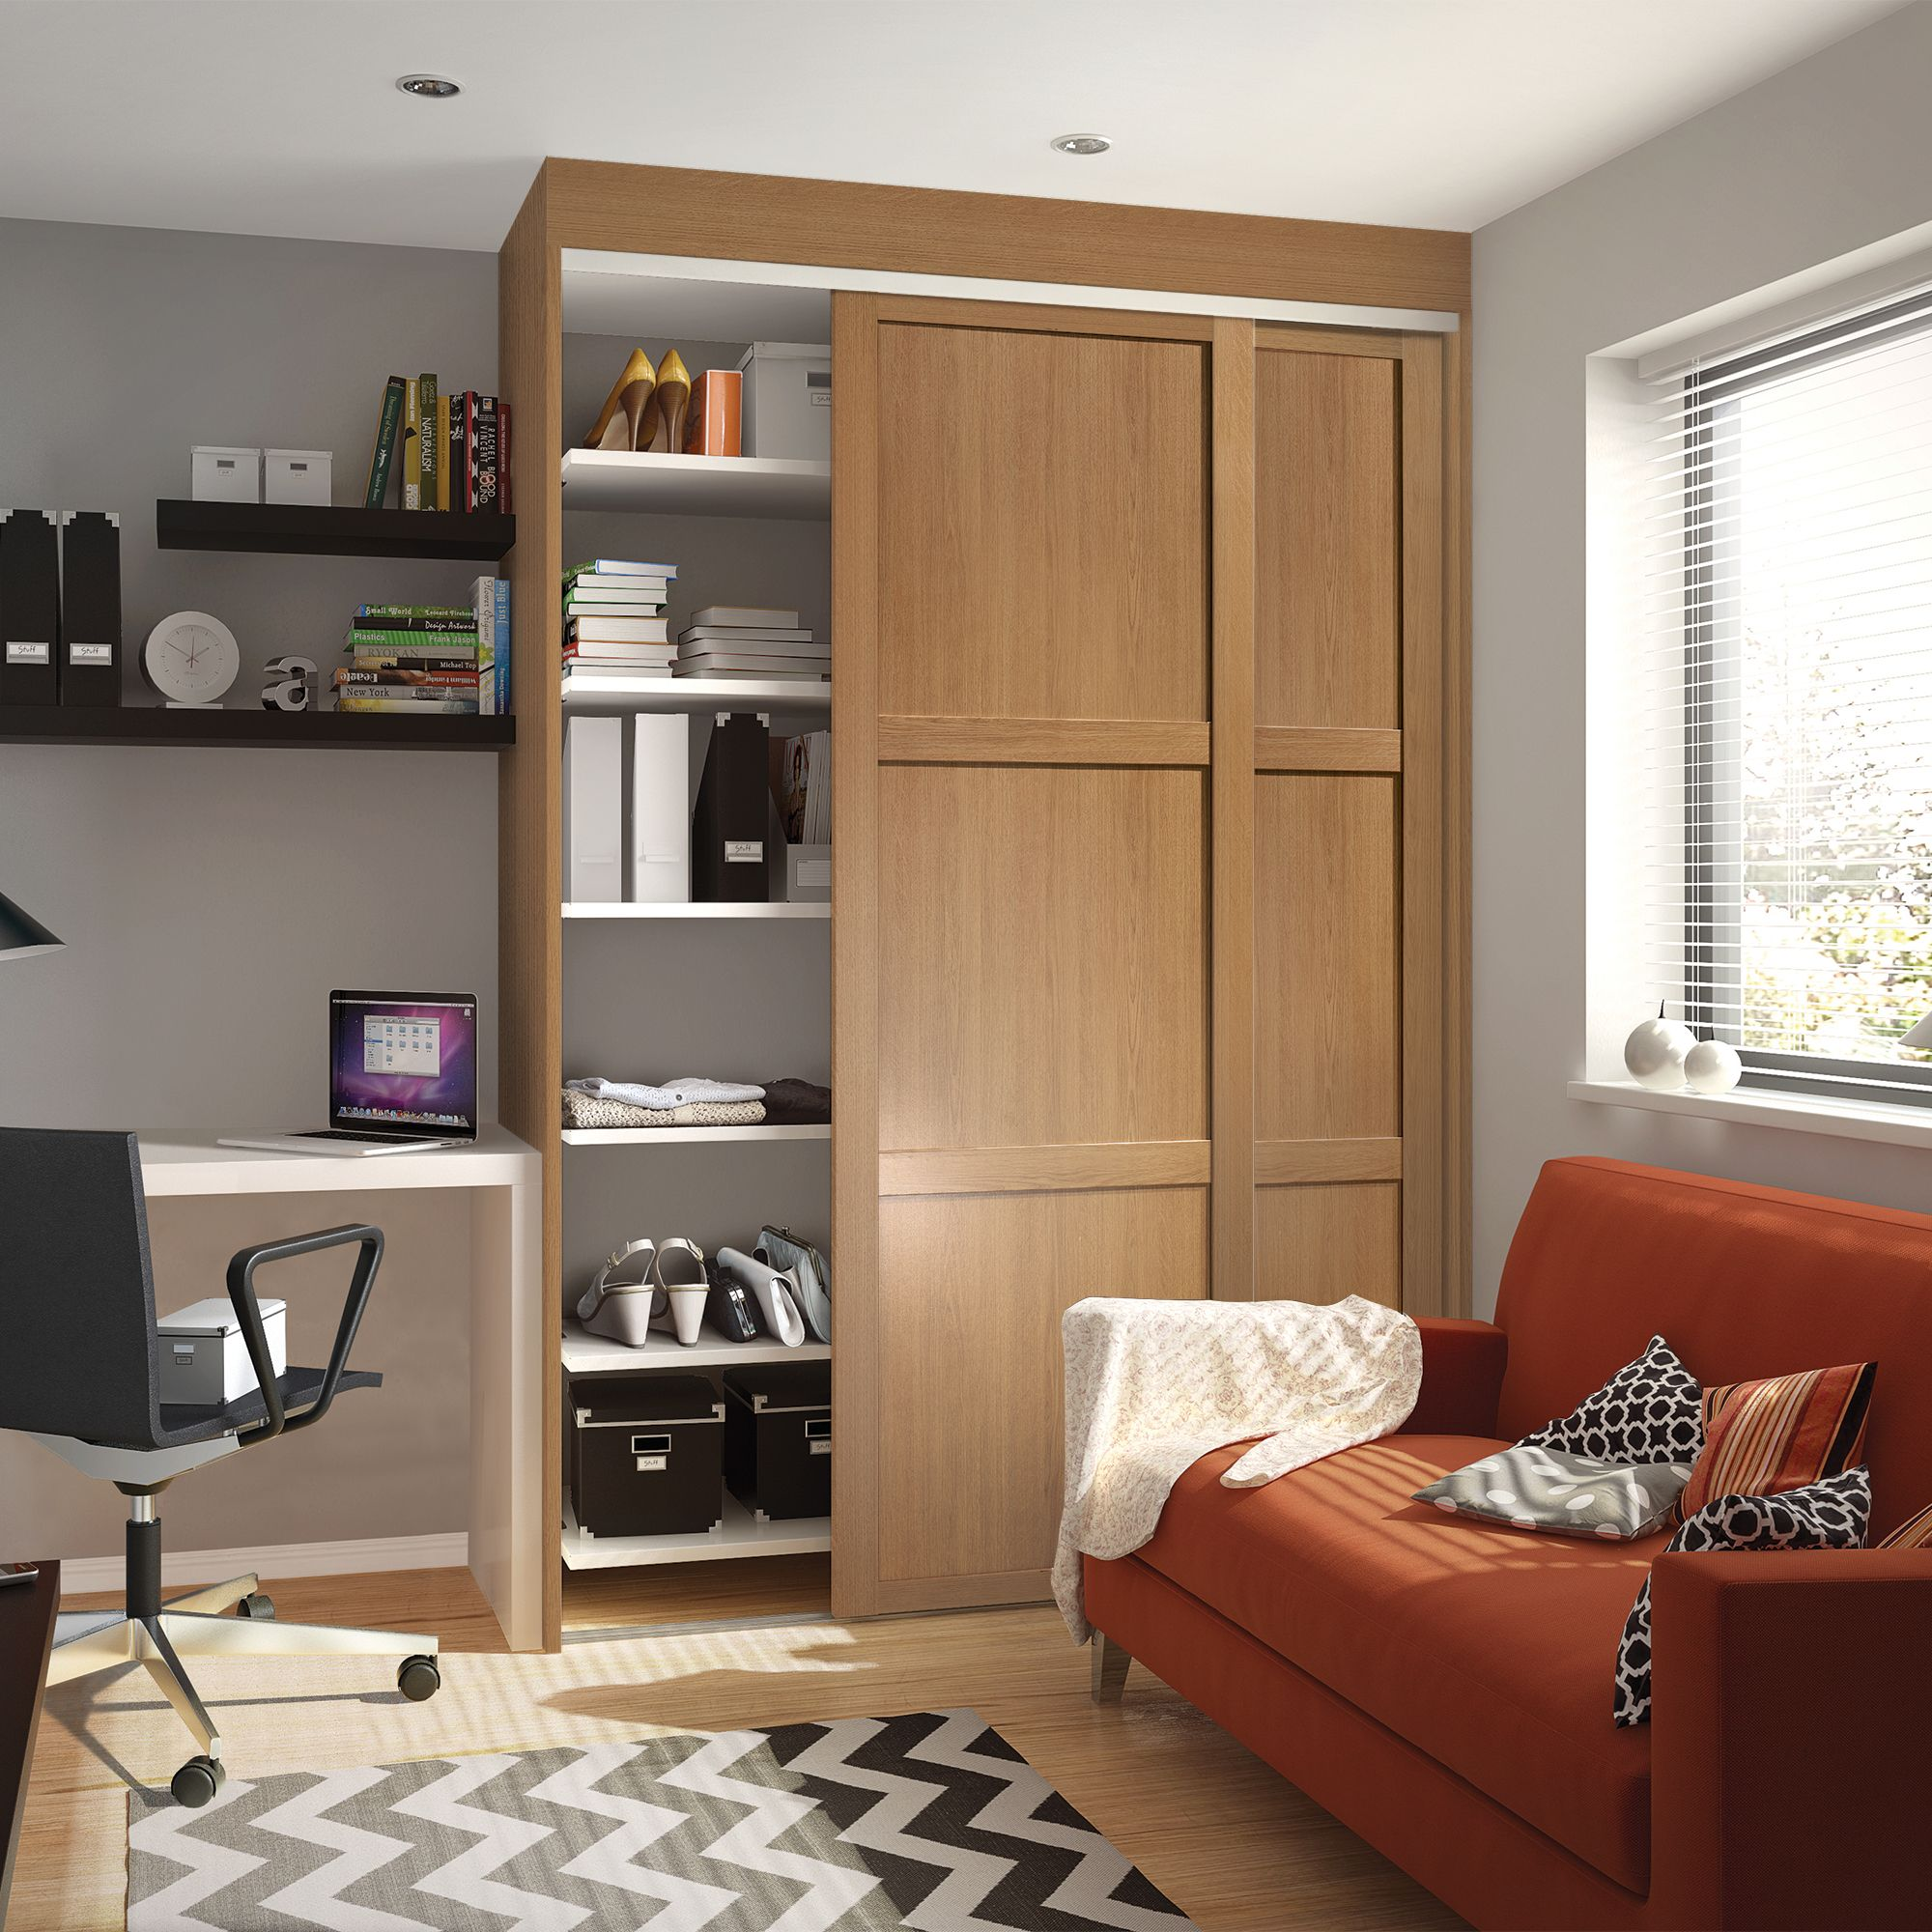 Shaker Single Doors & Sliding Wardrobe Doors \u0026 Kits | Bedroom Furniture | DIY at B\u0026Q